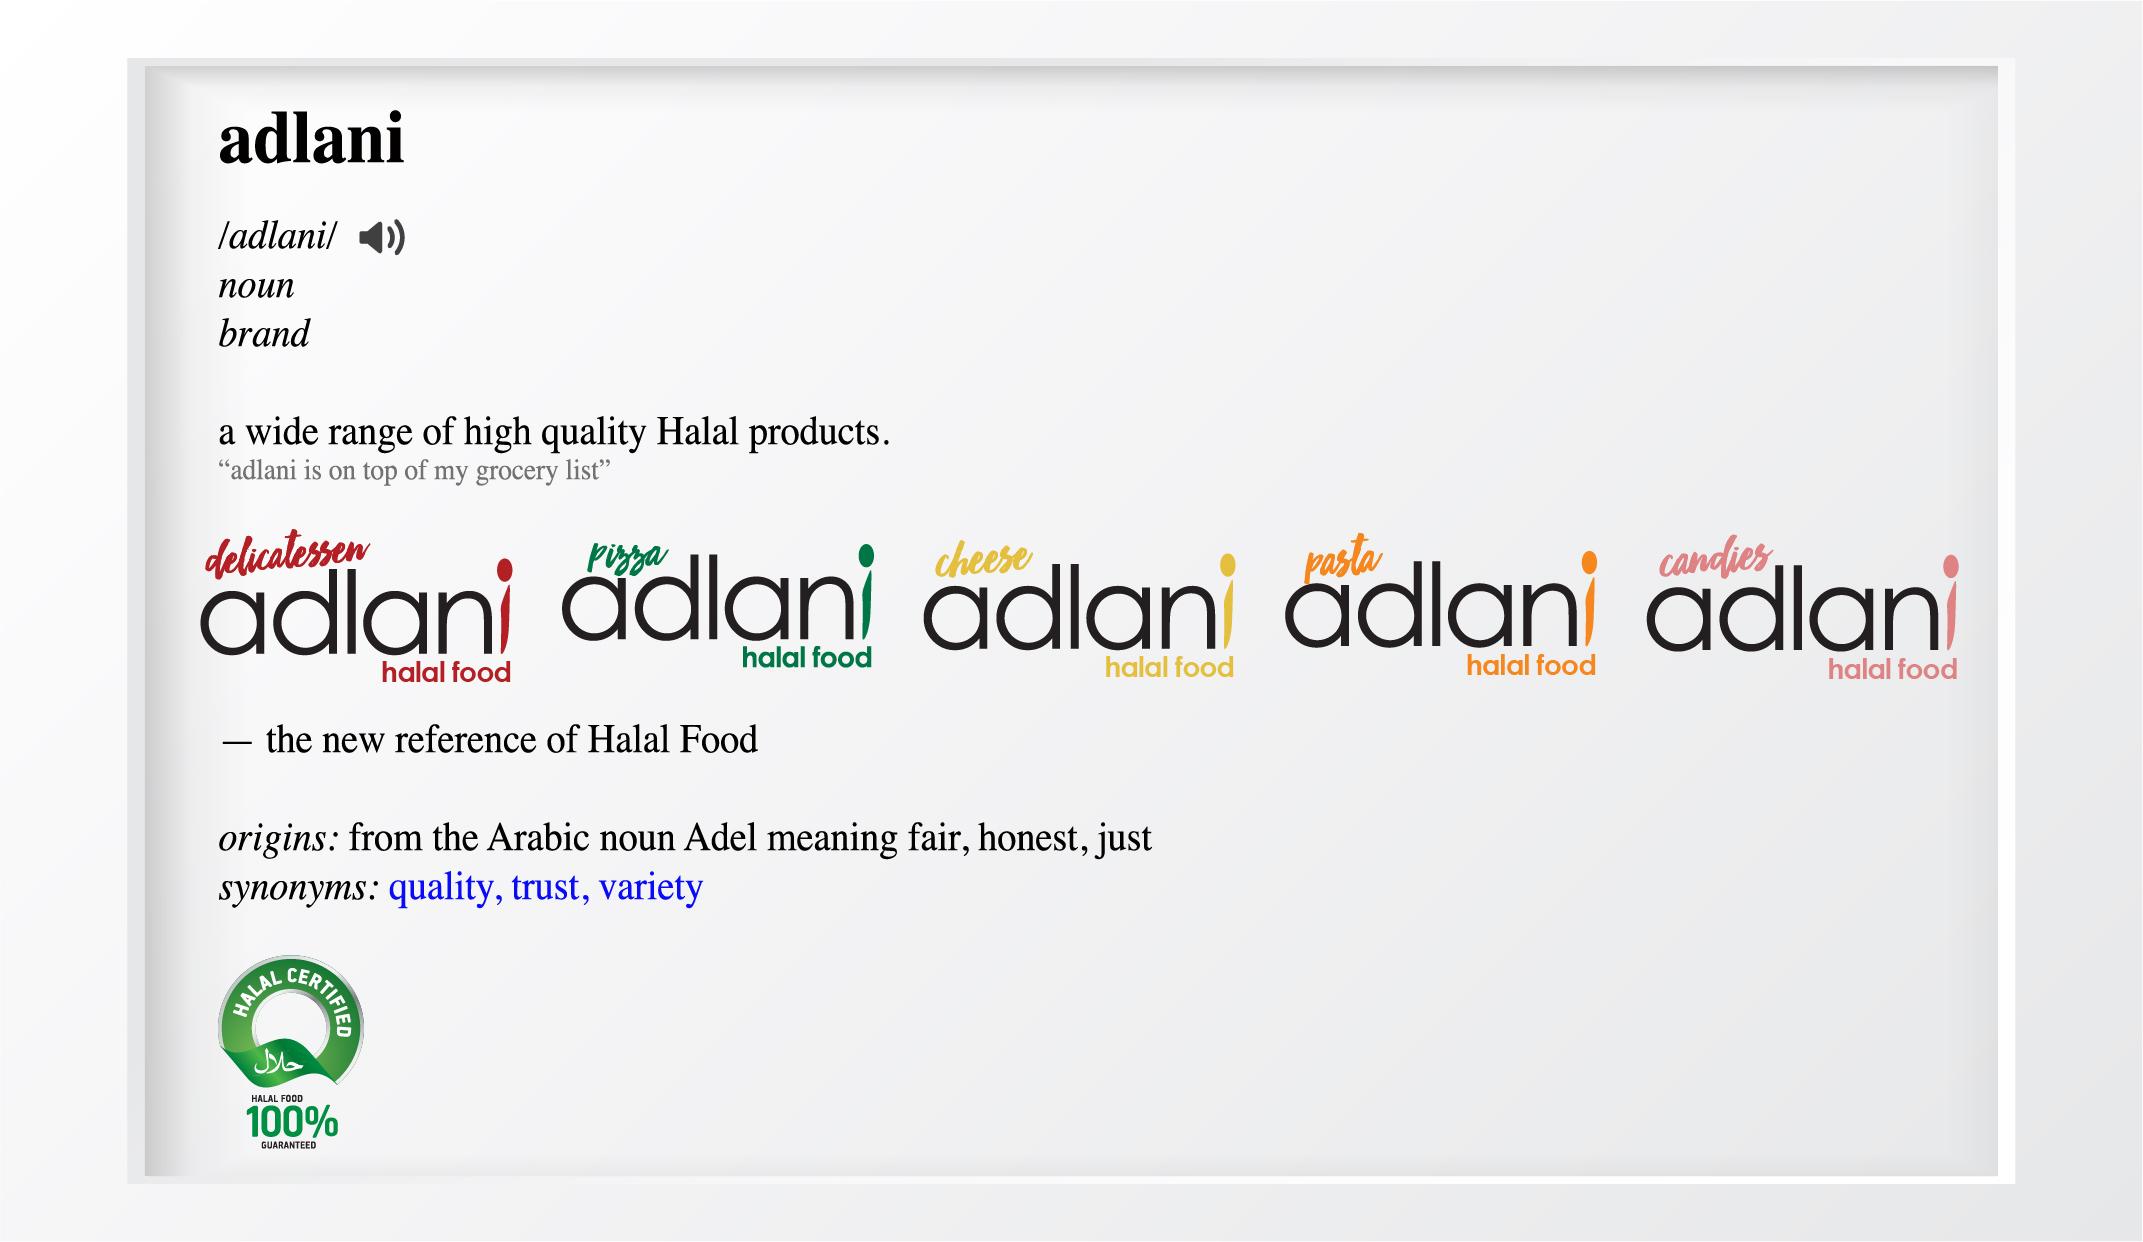 adlani definition.jpg